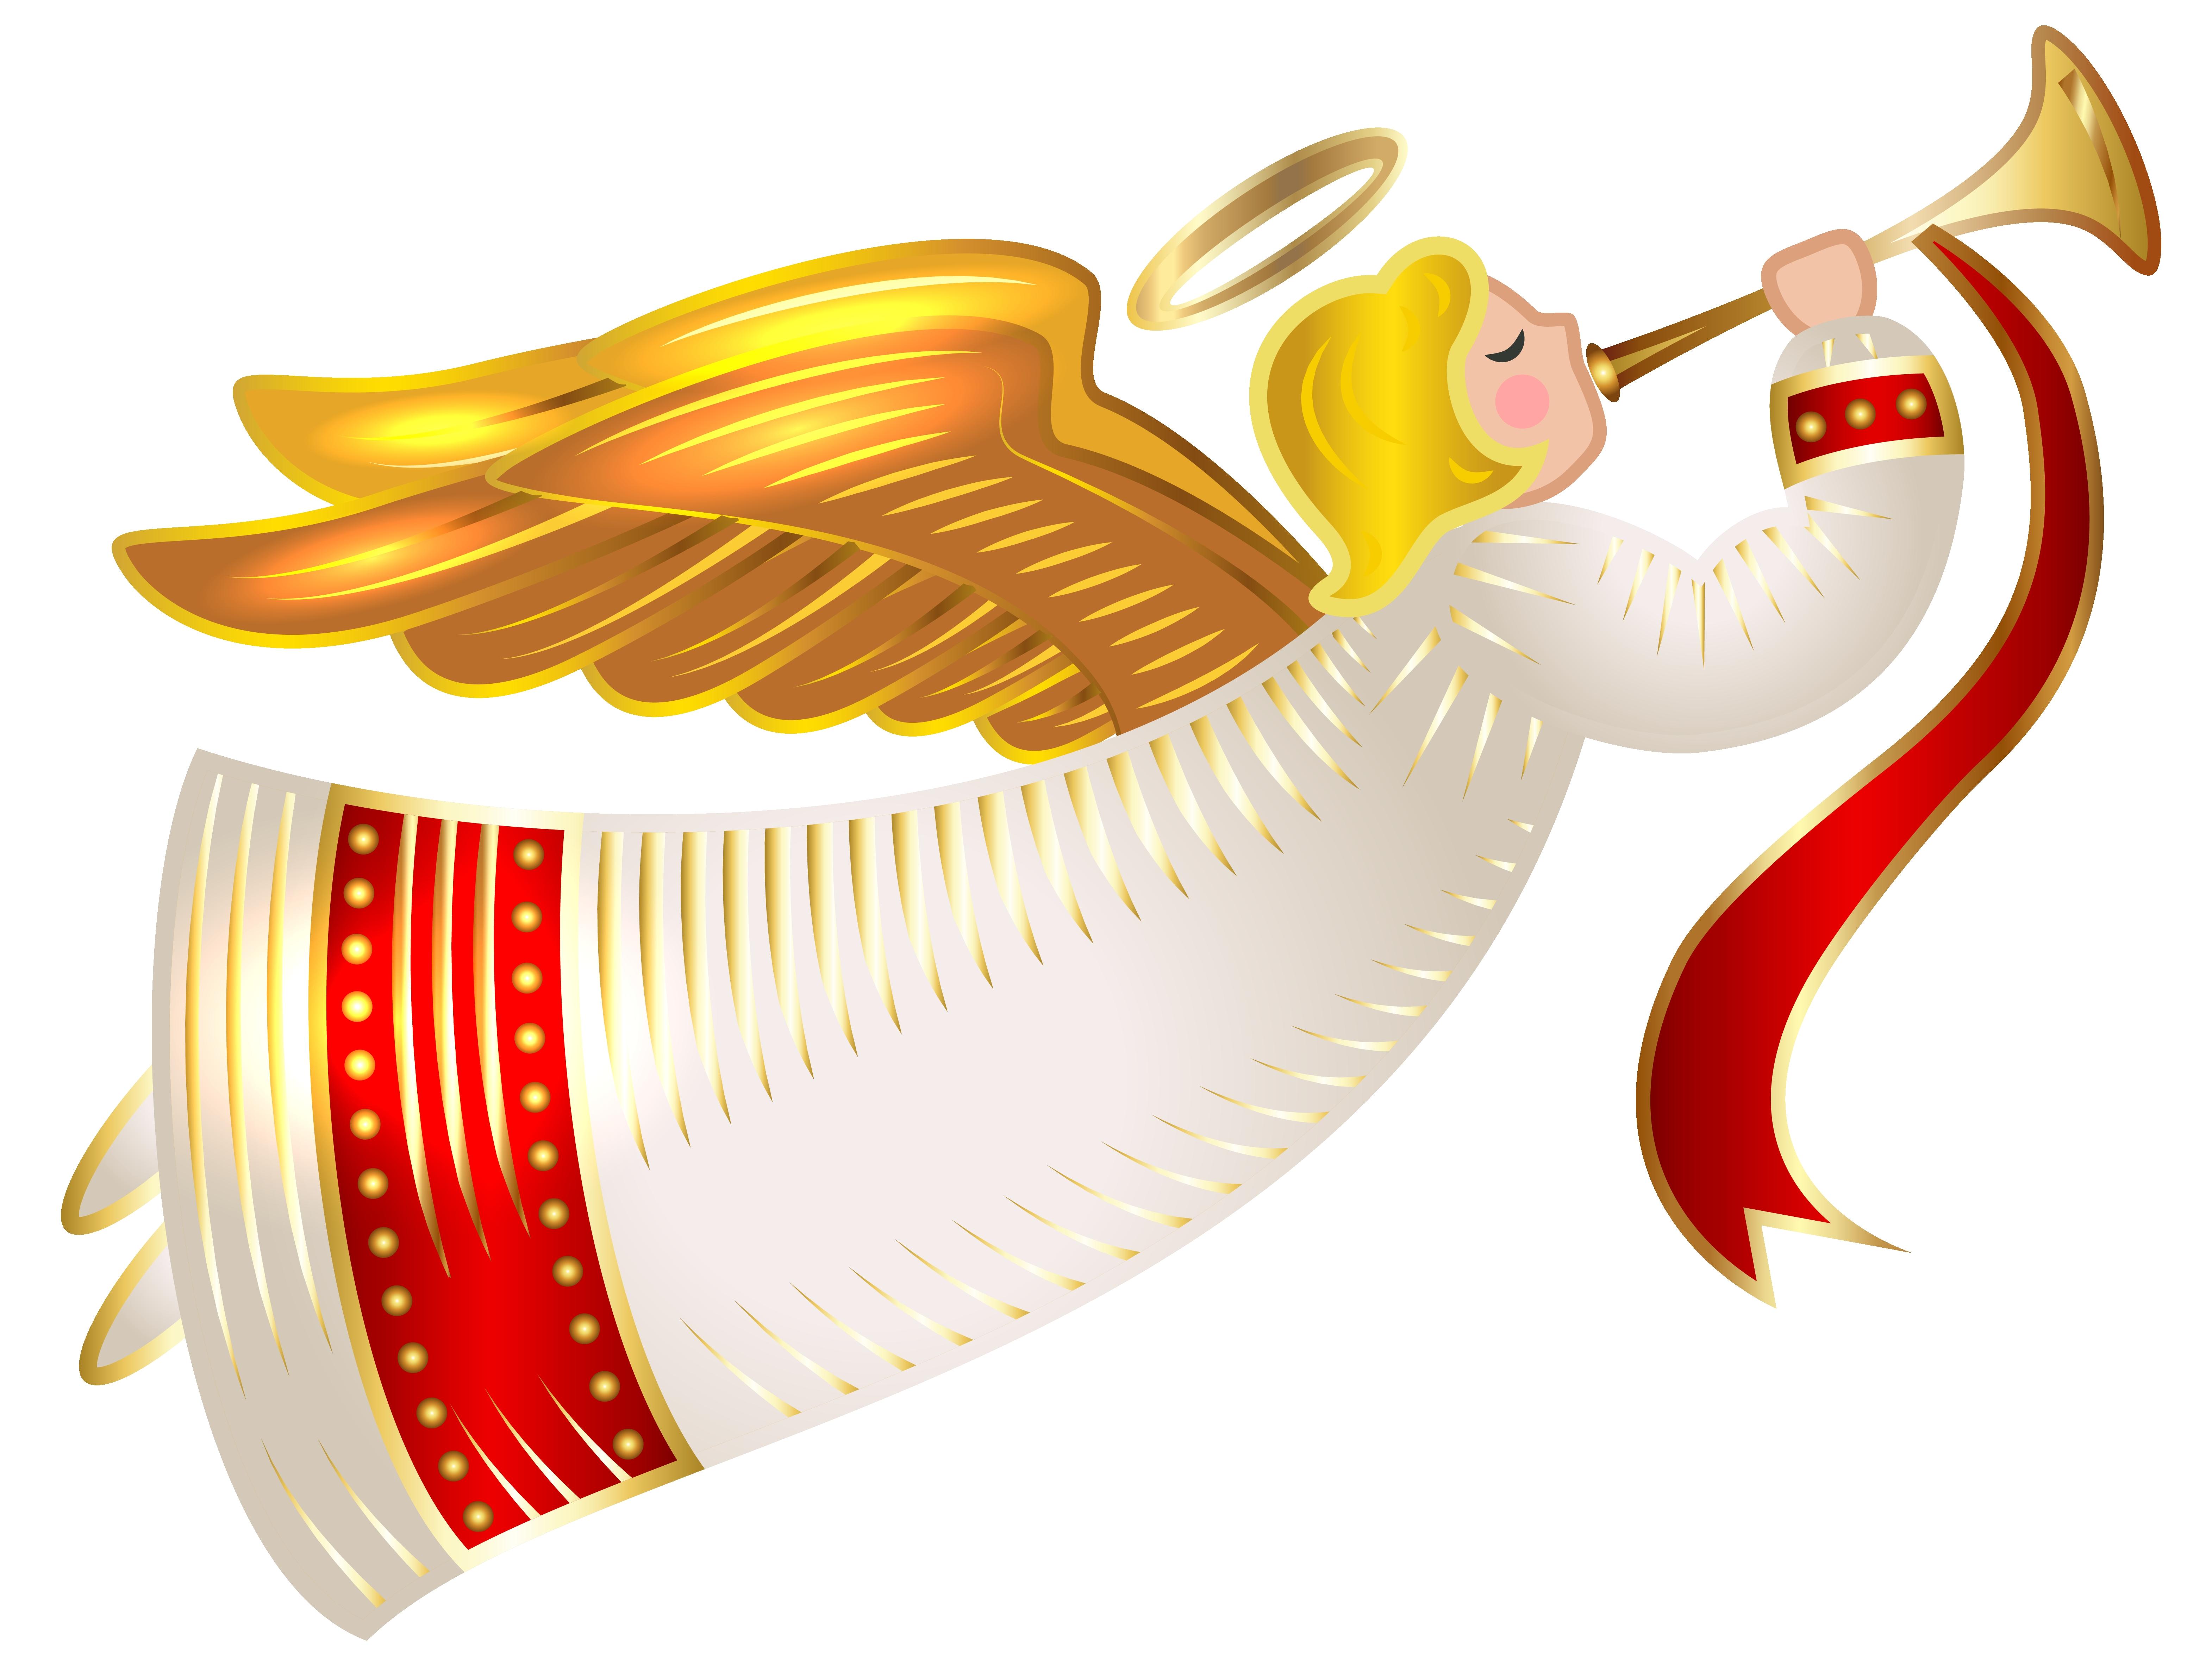 6282x4732 Best Of Angels Clipart Design